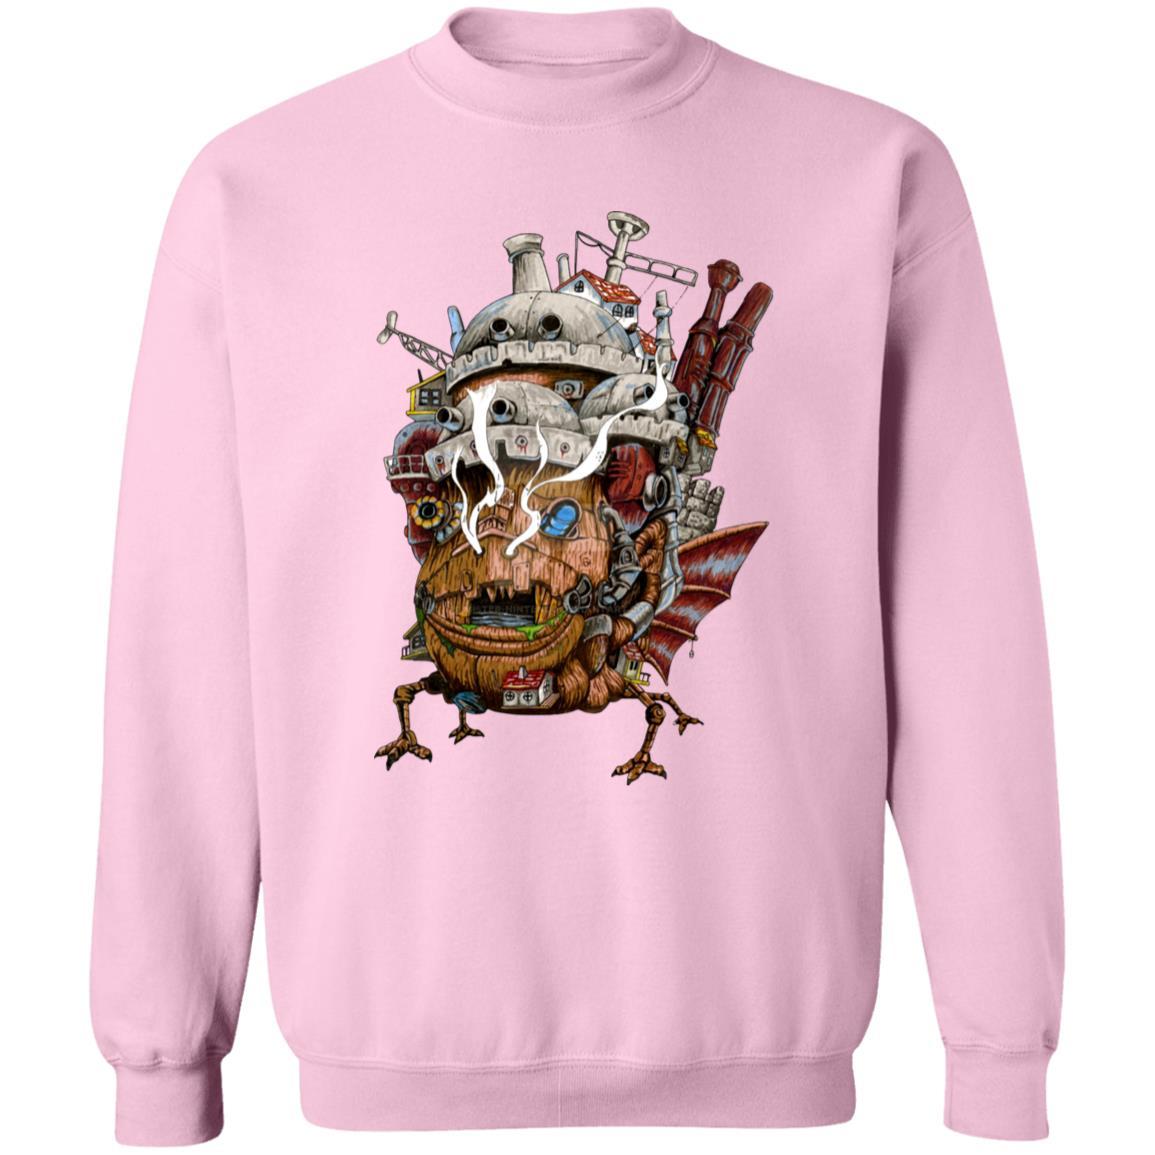 Howl's Moving Castle – Smoking Sweatshirt